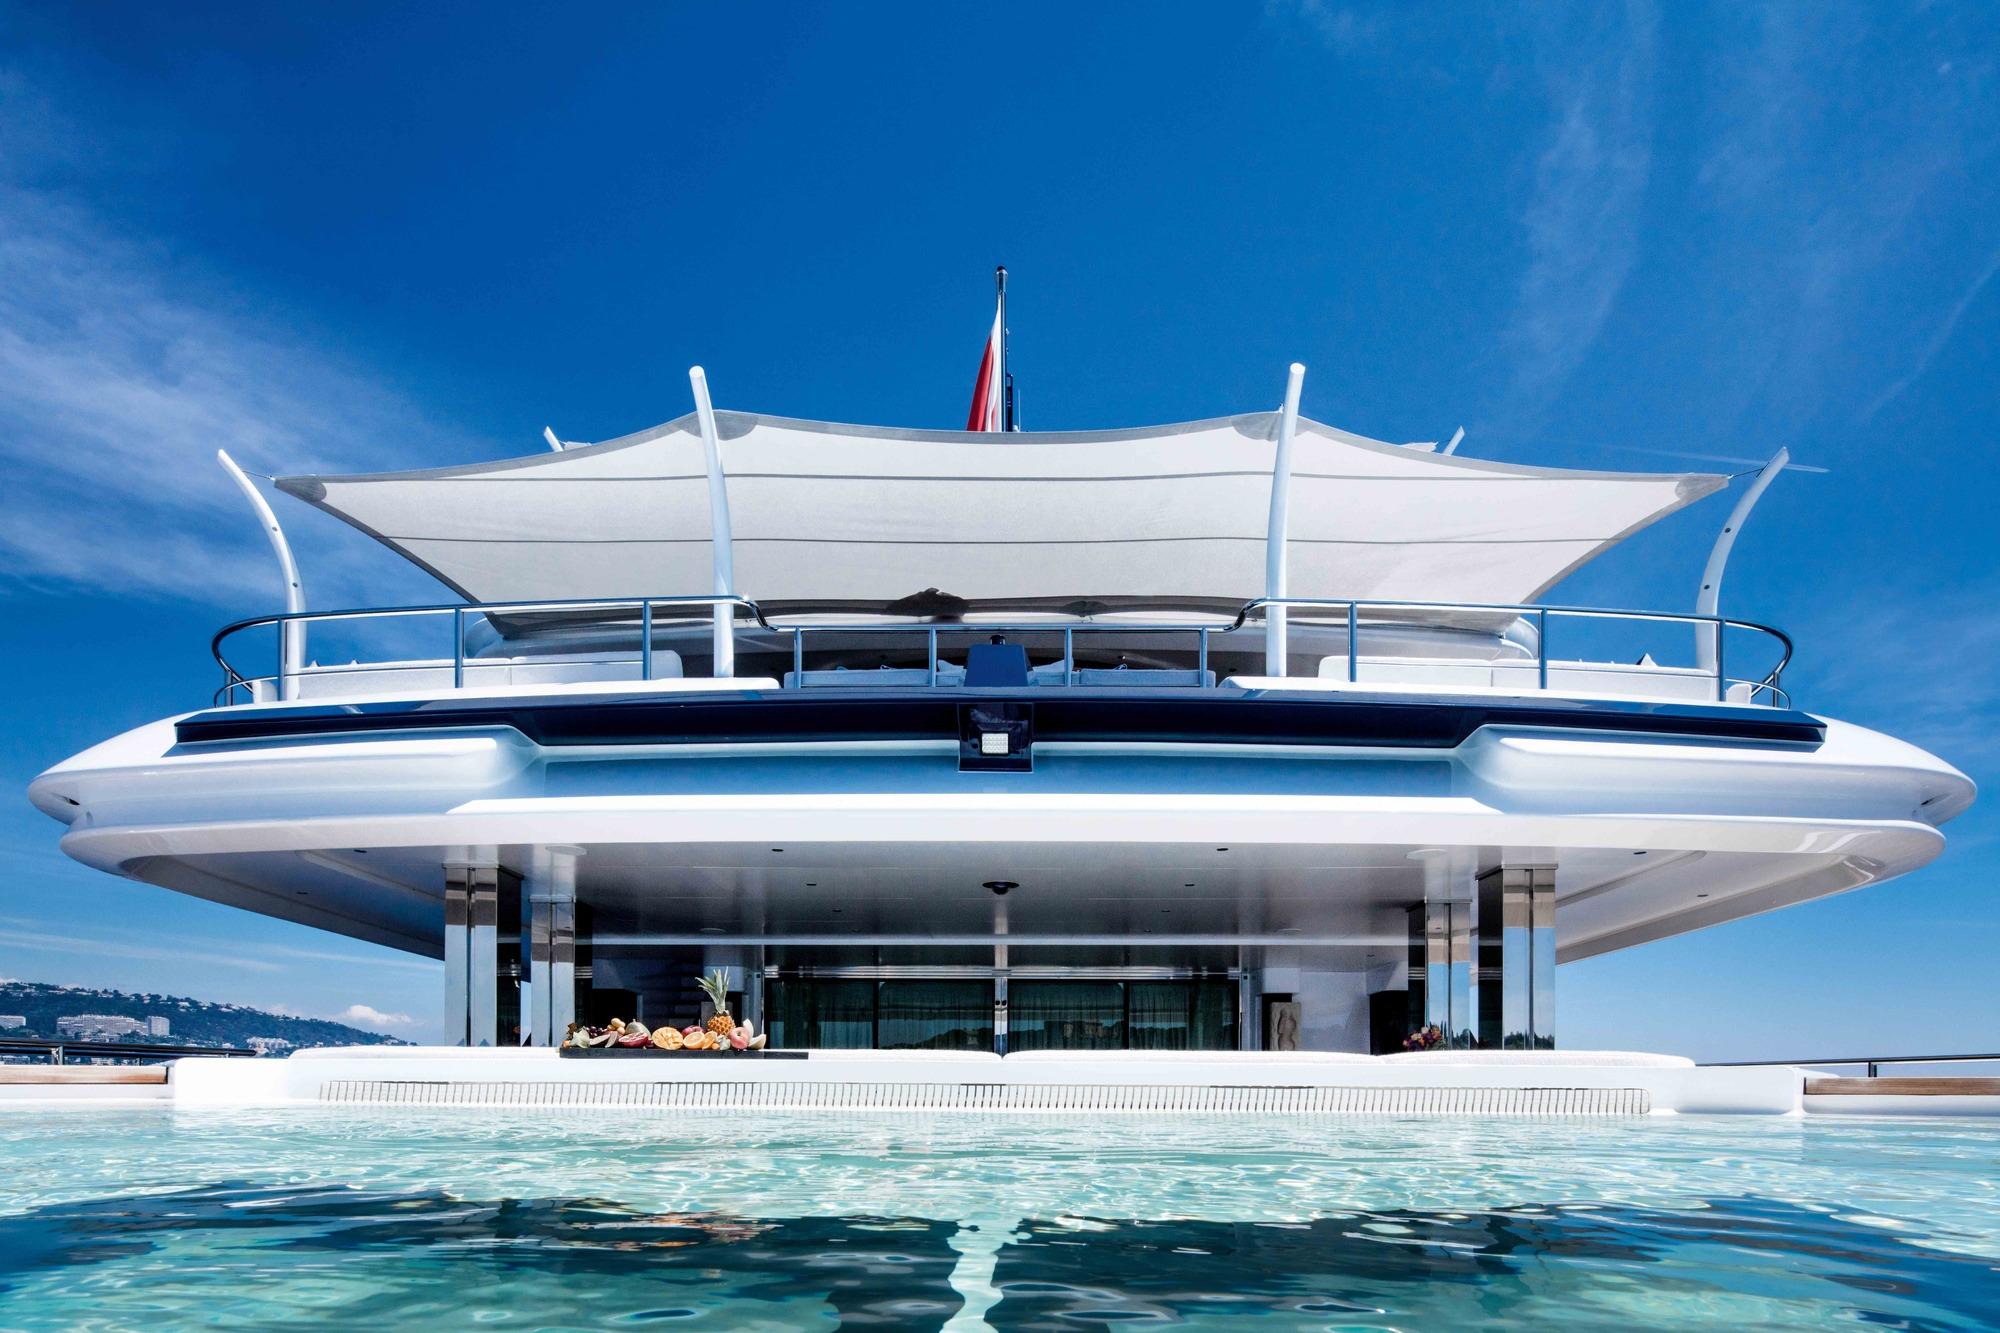 Alquiler de yates. Alquiler de barcos baratos en Ibiza. Yates de alquiler en Ibiza